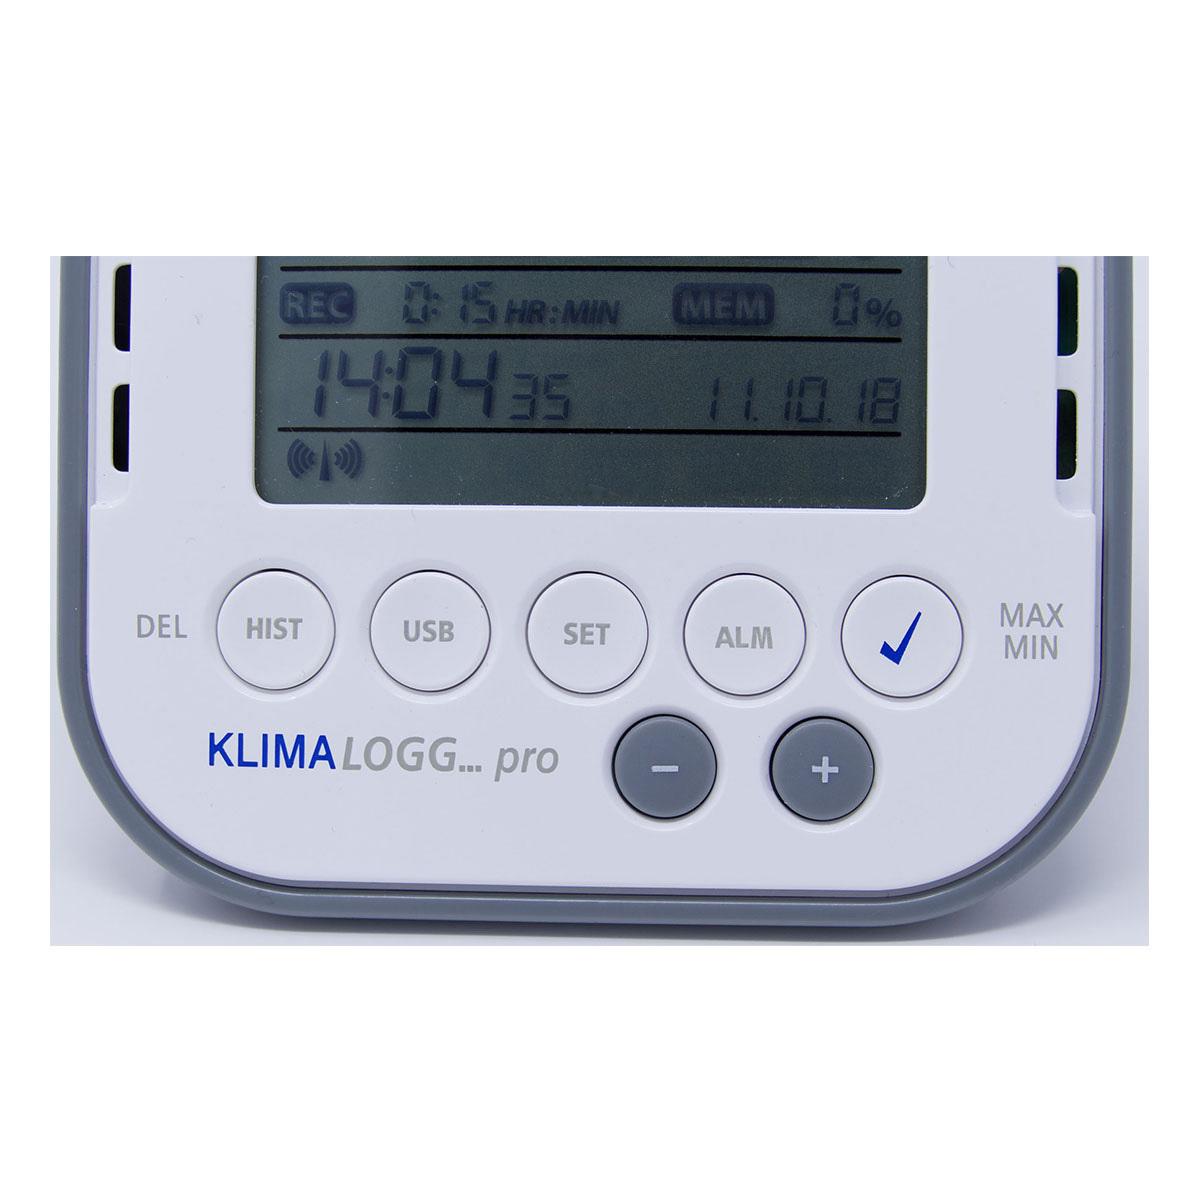 30-3039-it-profi-thermo-hygrometer-mit-datenlogger-funktion-klimalogg-pro-ansicht1-1200x1200px.jpg